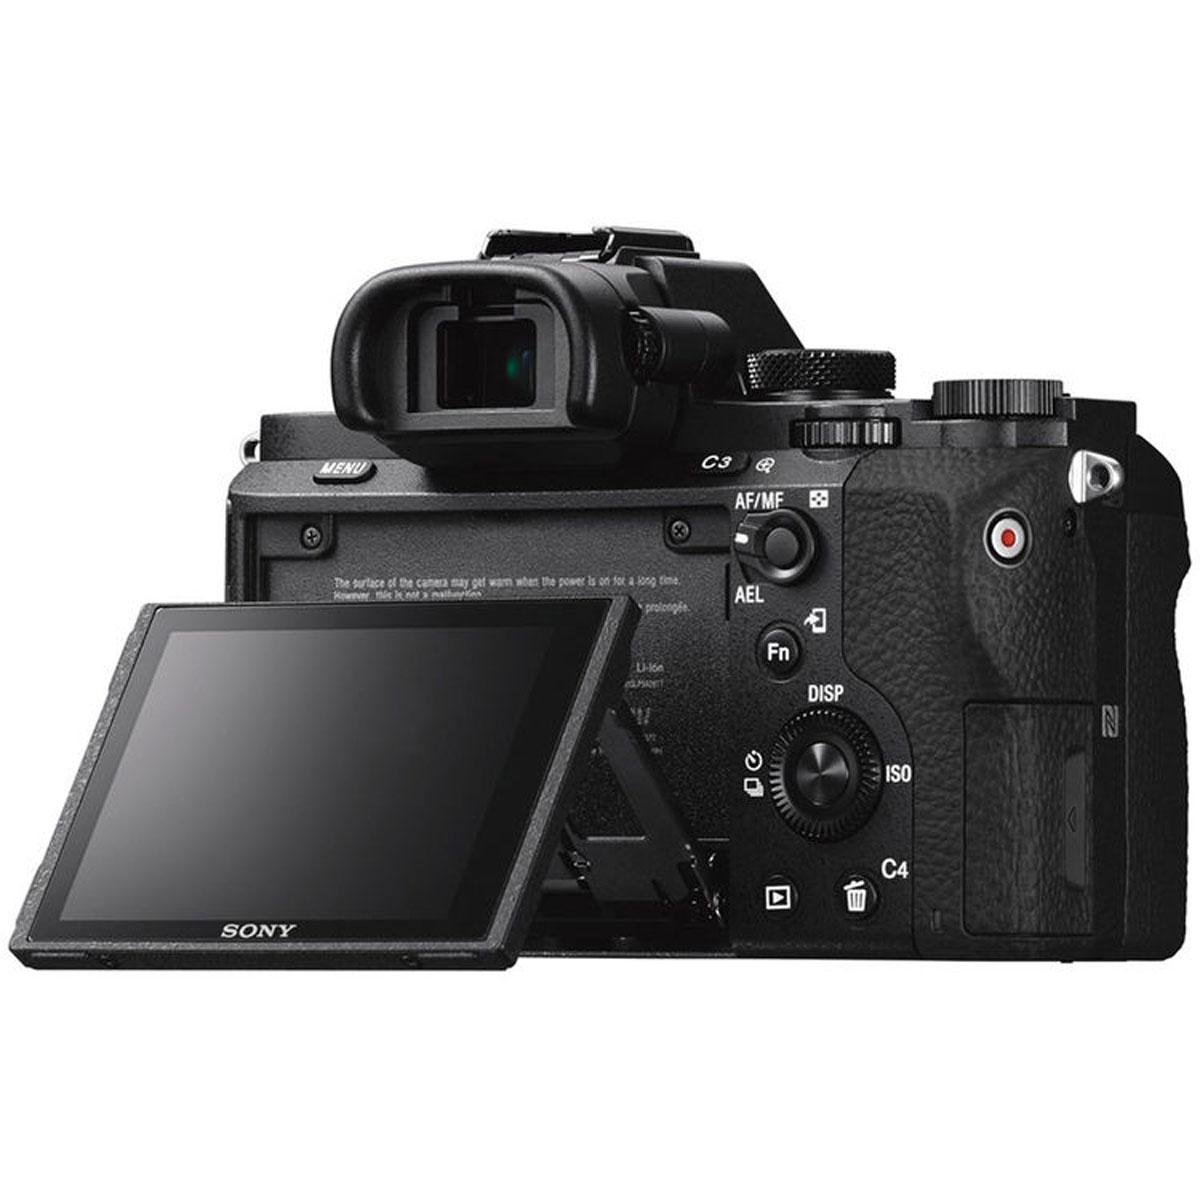 Беззеркальный фотоаппарат Sony Alpha A7 II (M2) Kit 28-70mm, Black Sony